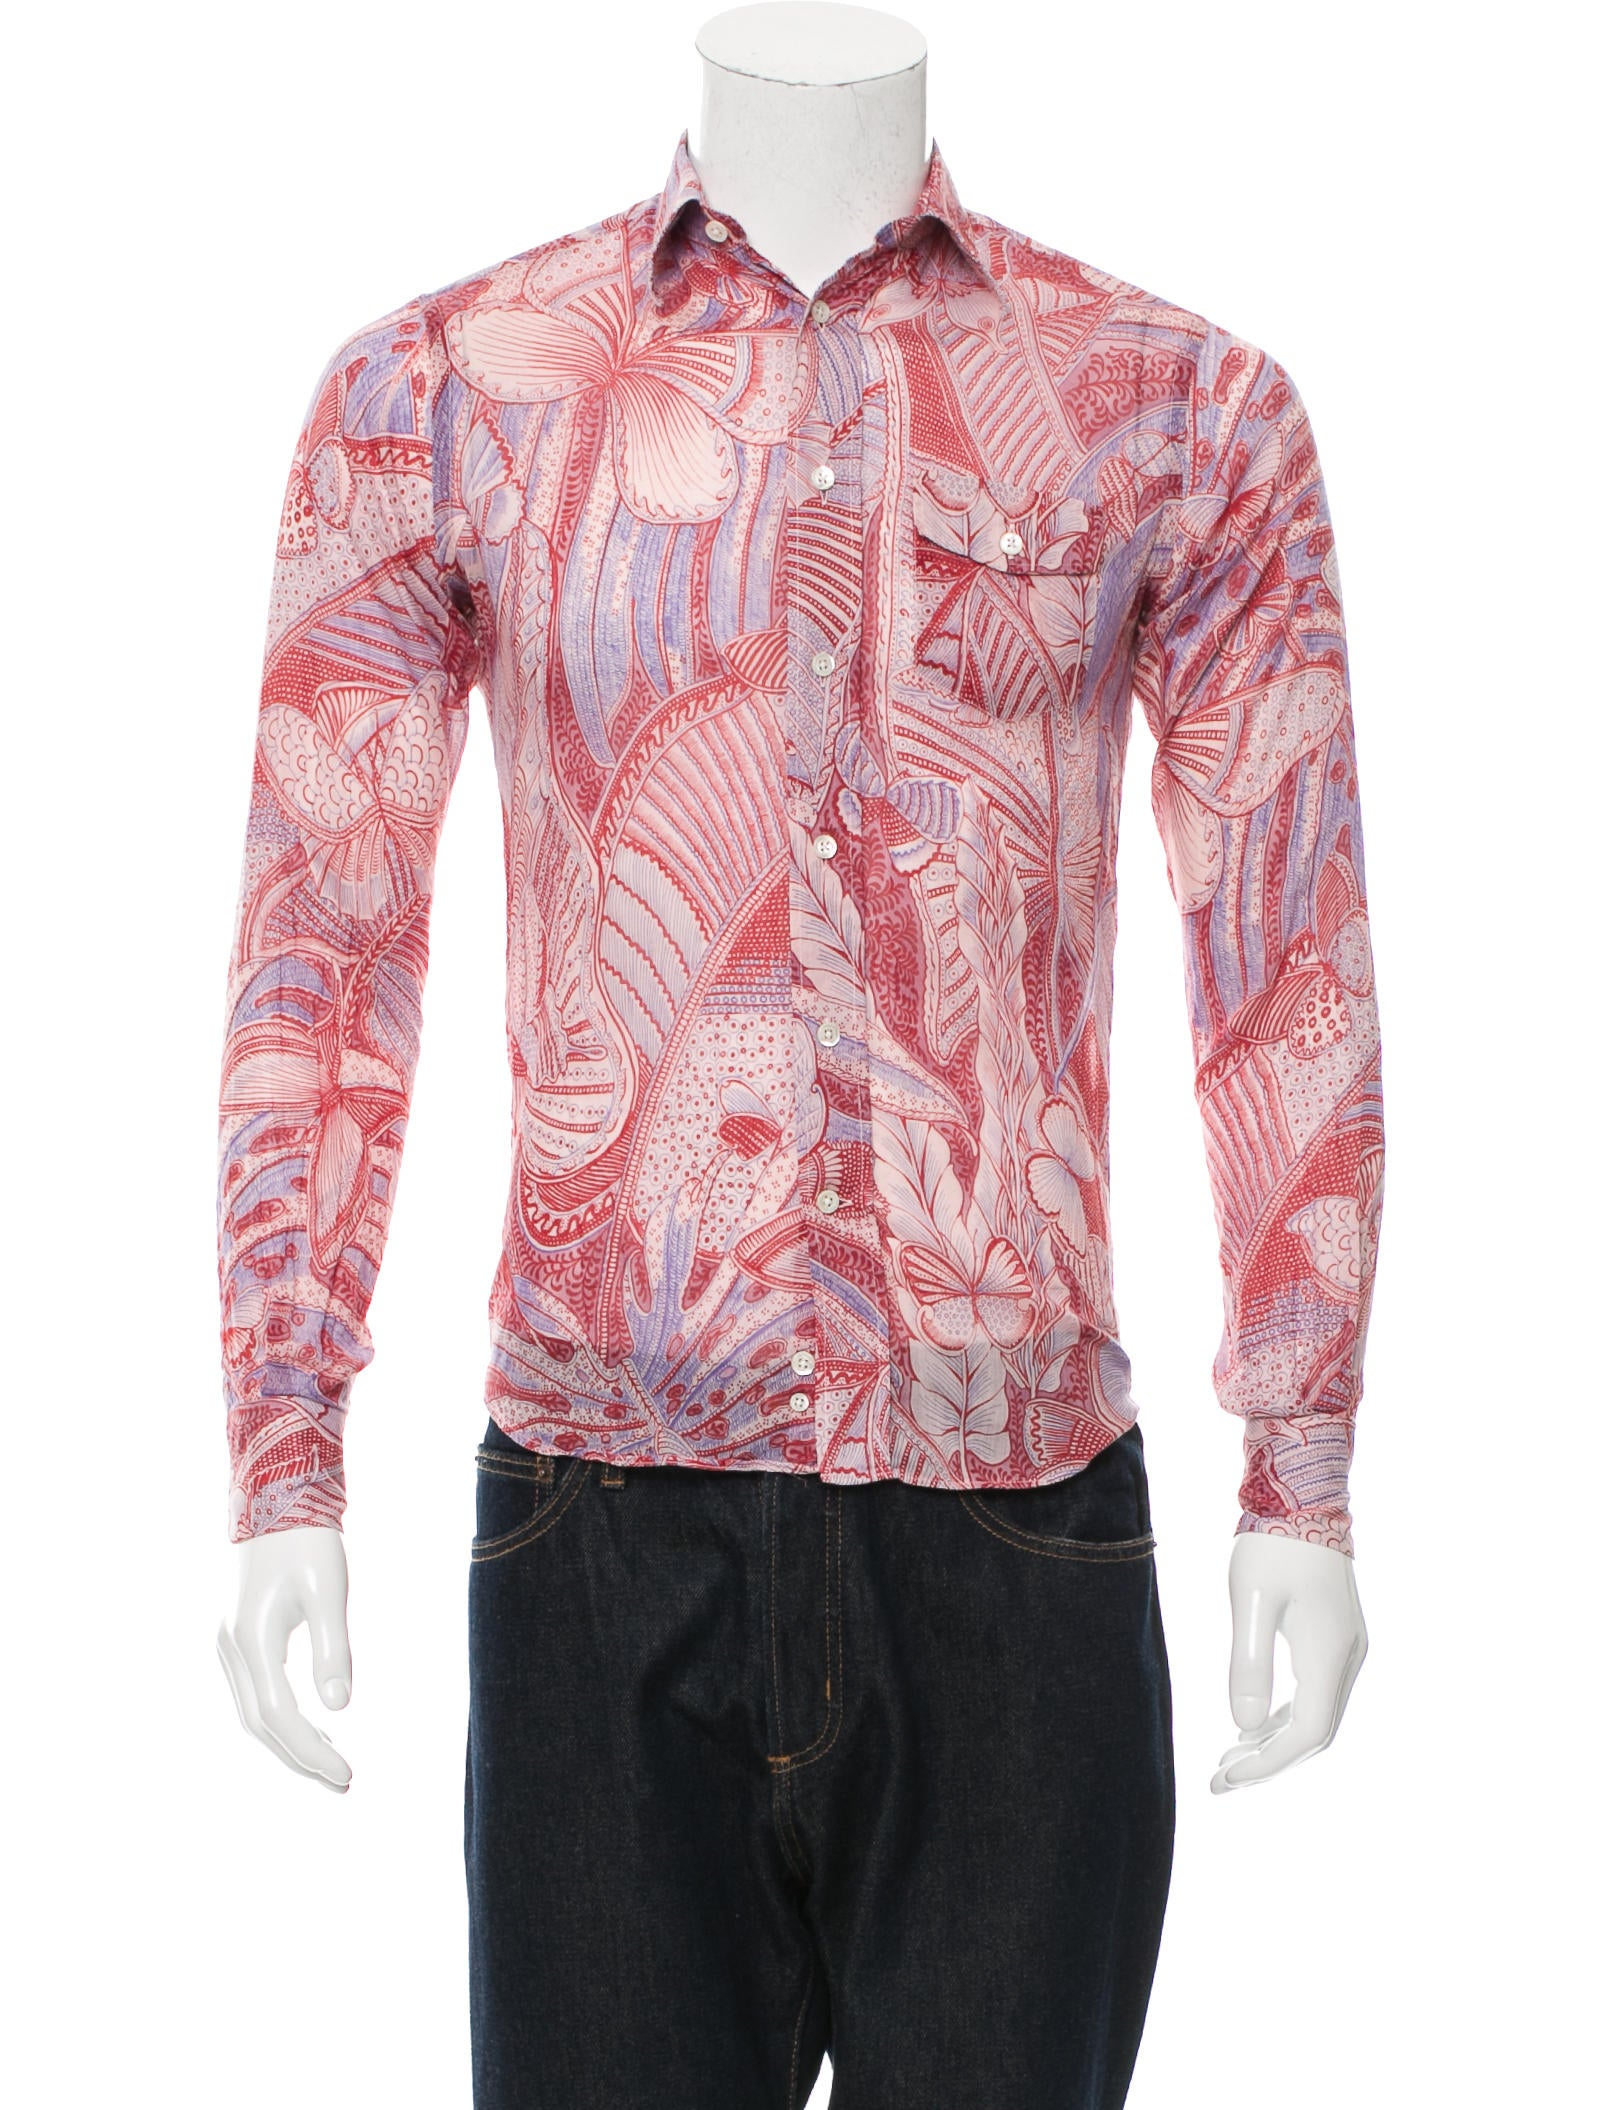 Paul joe floral print button up shirt clothing for Floral print button up shirt